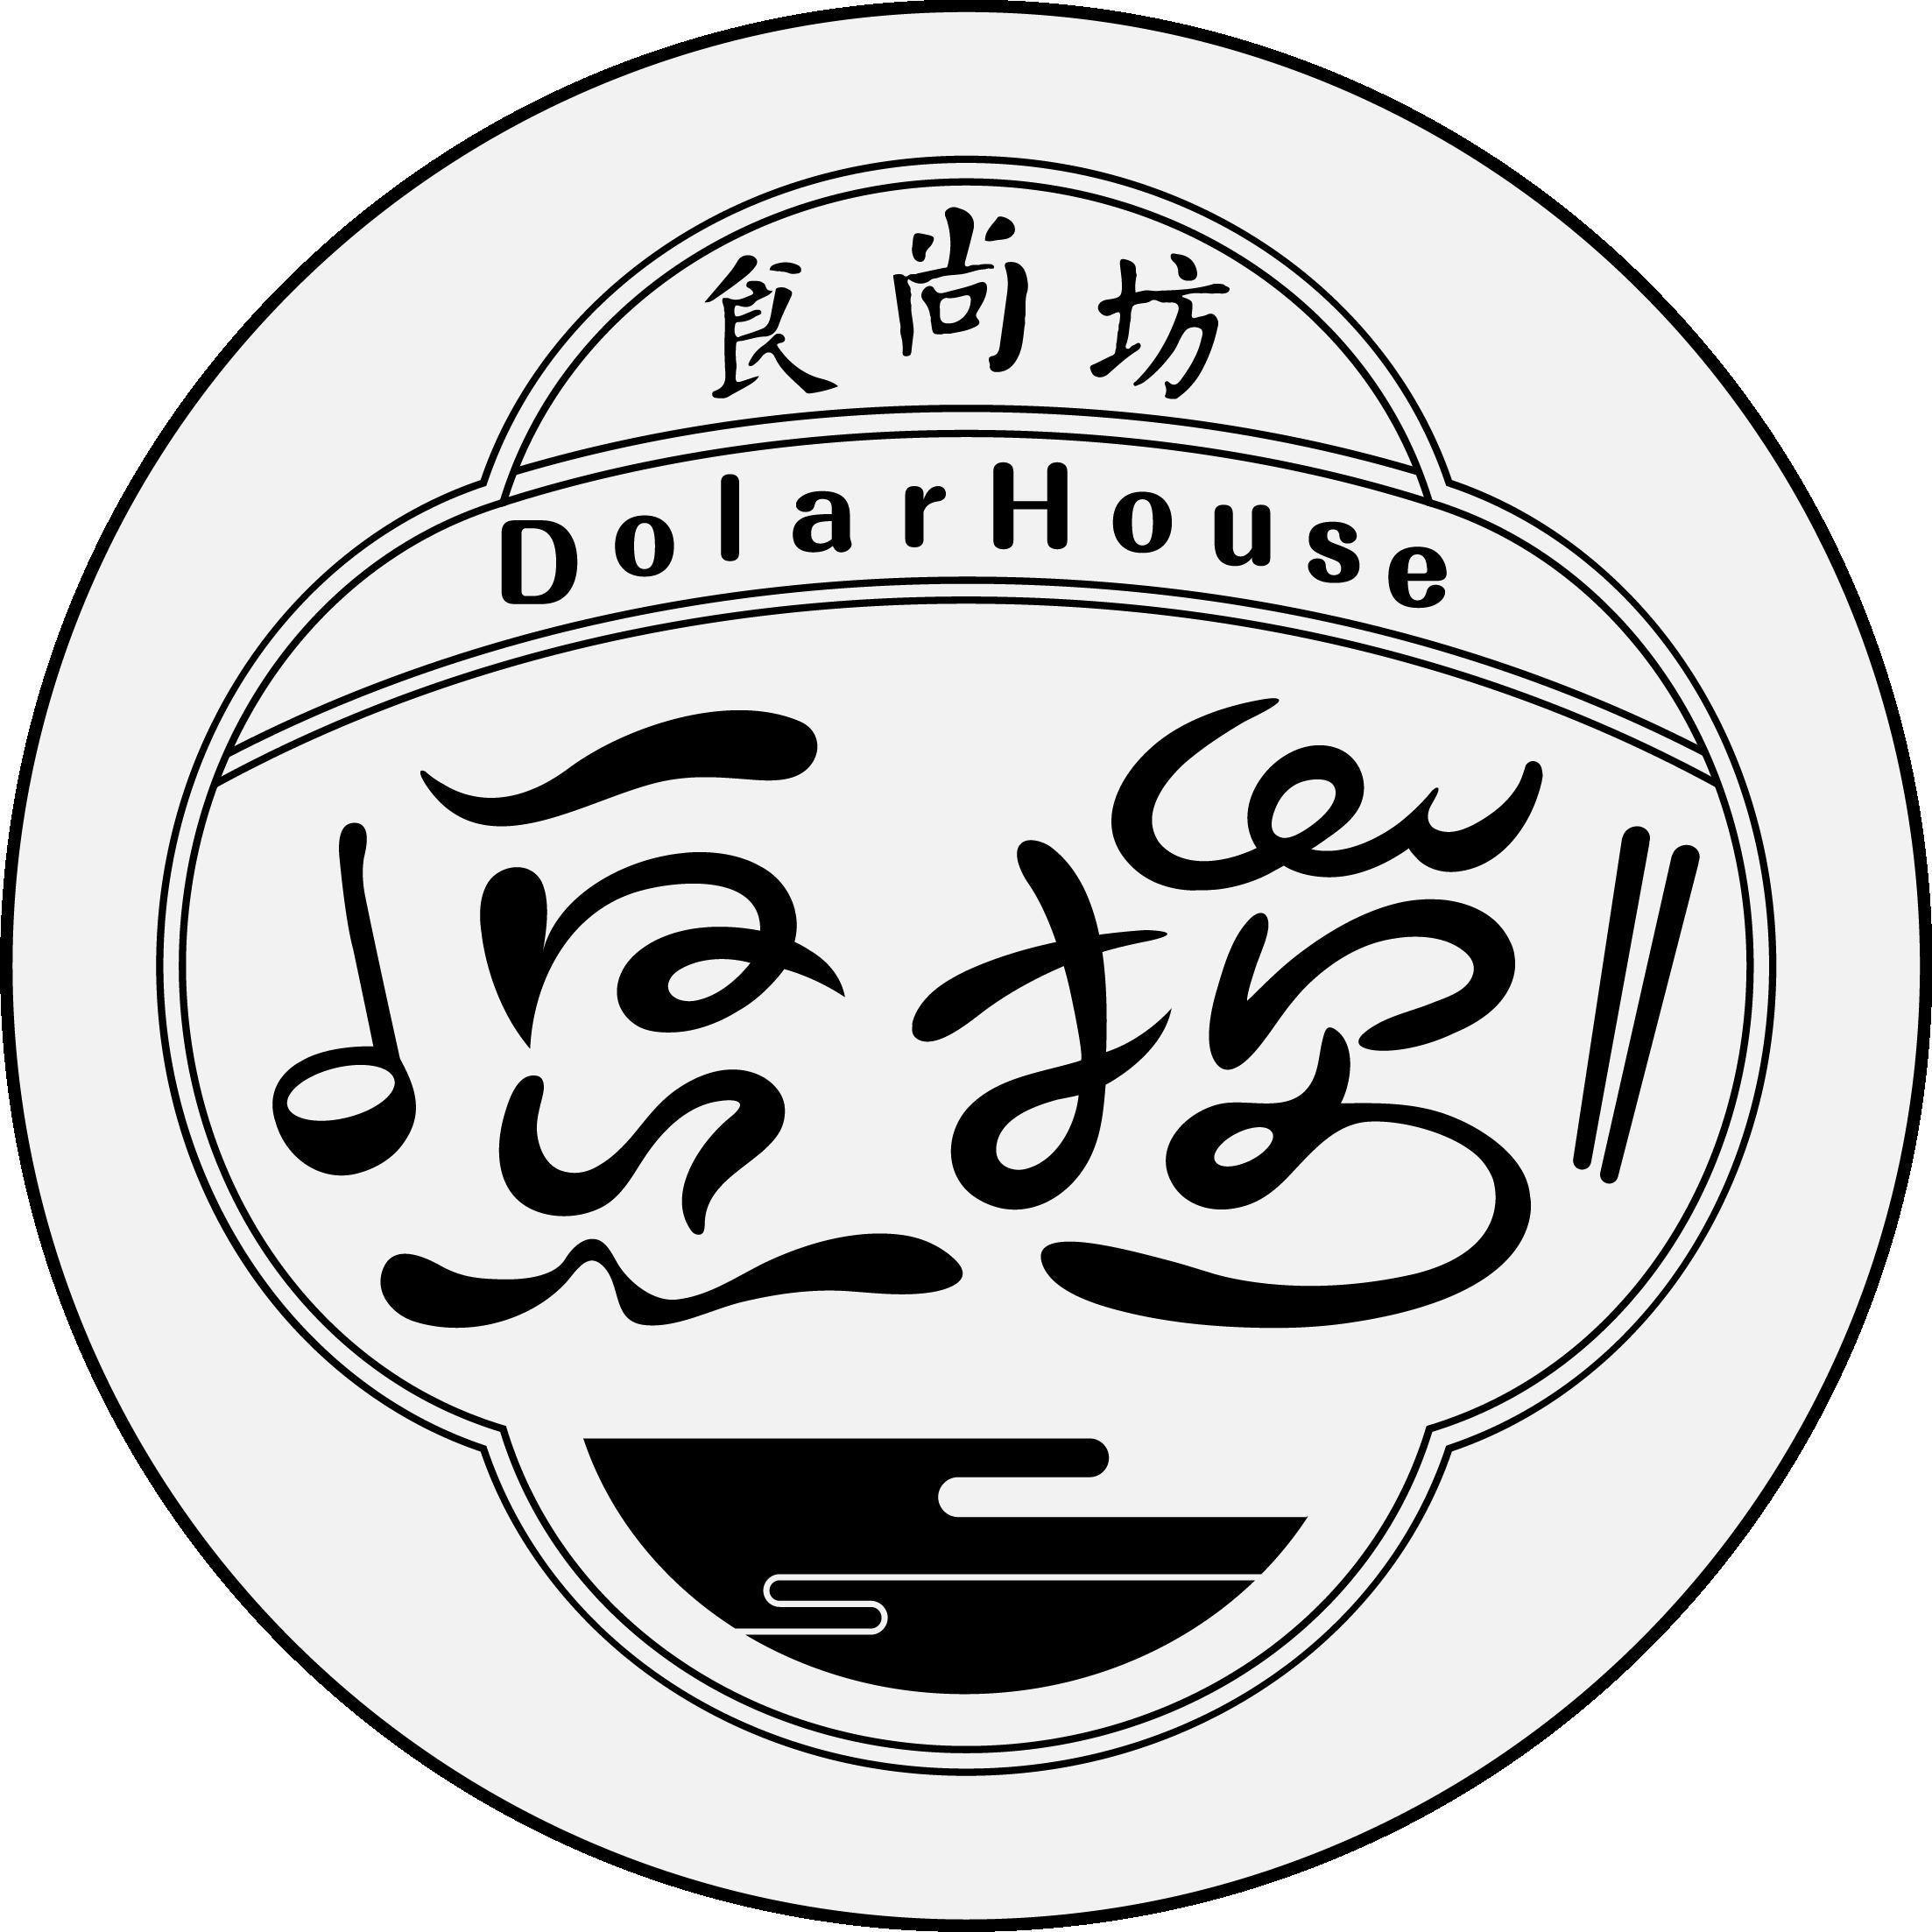 Dolar House GmbH